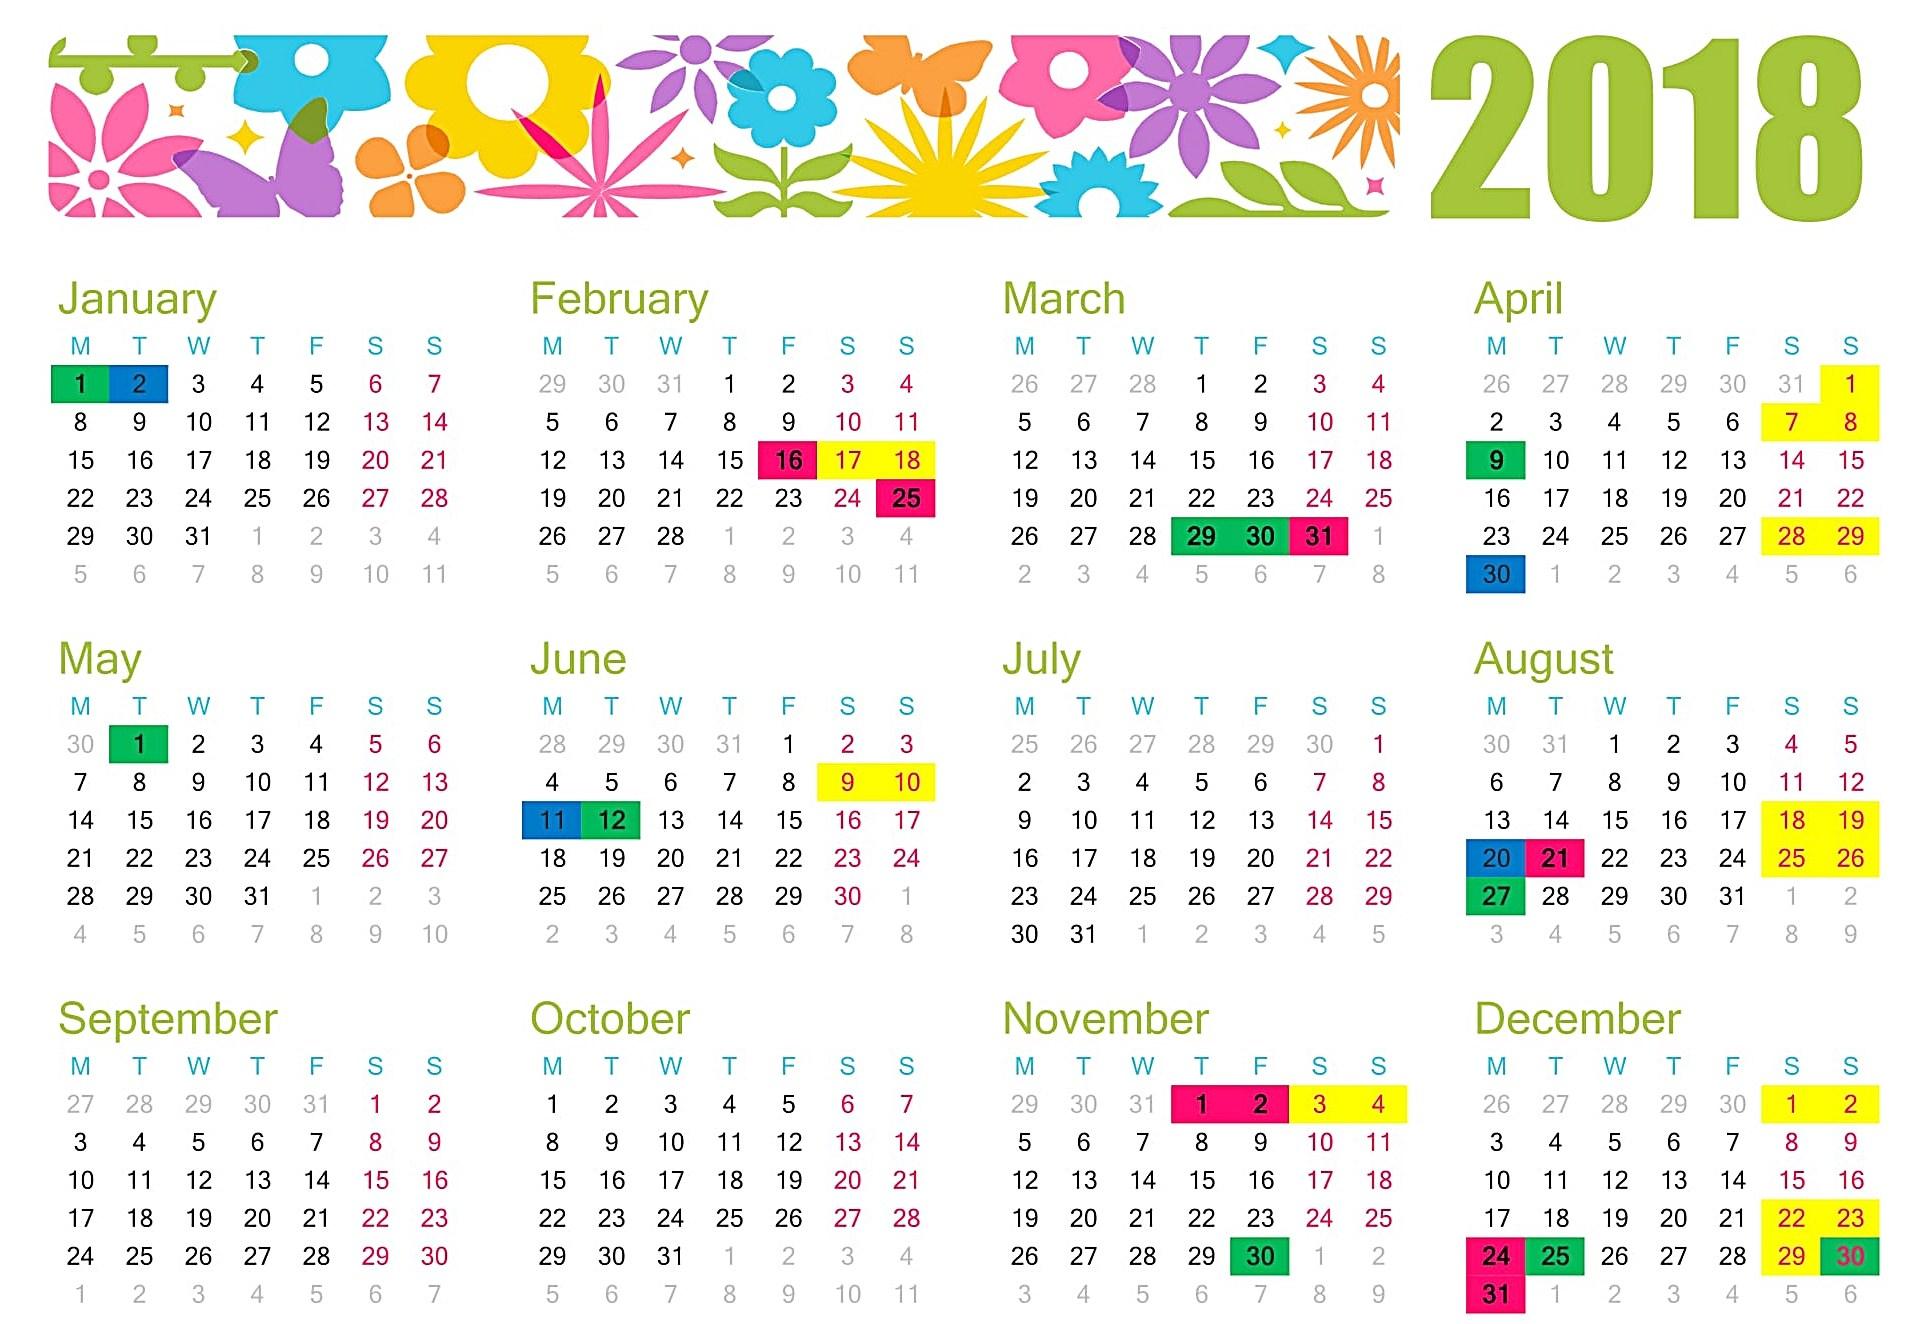 November 2018 Holidays Philippines - Free August 2019